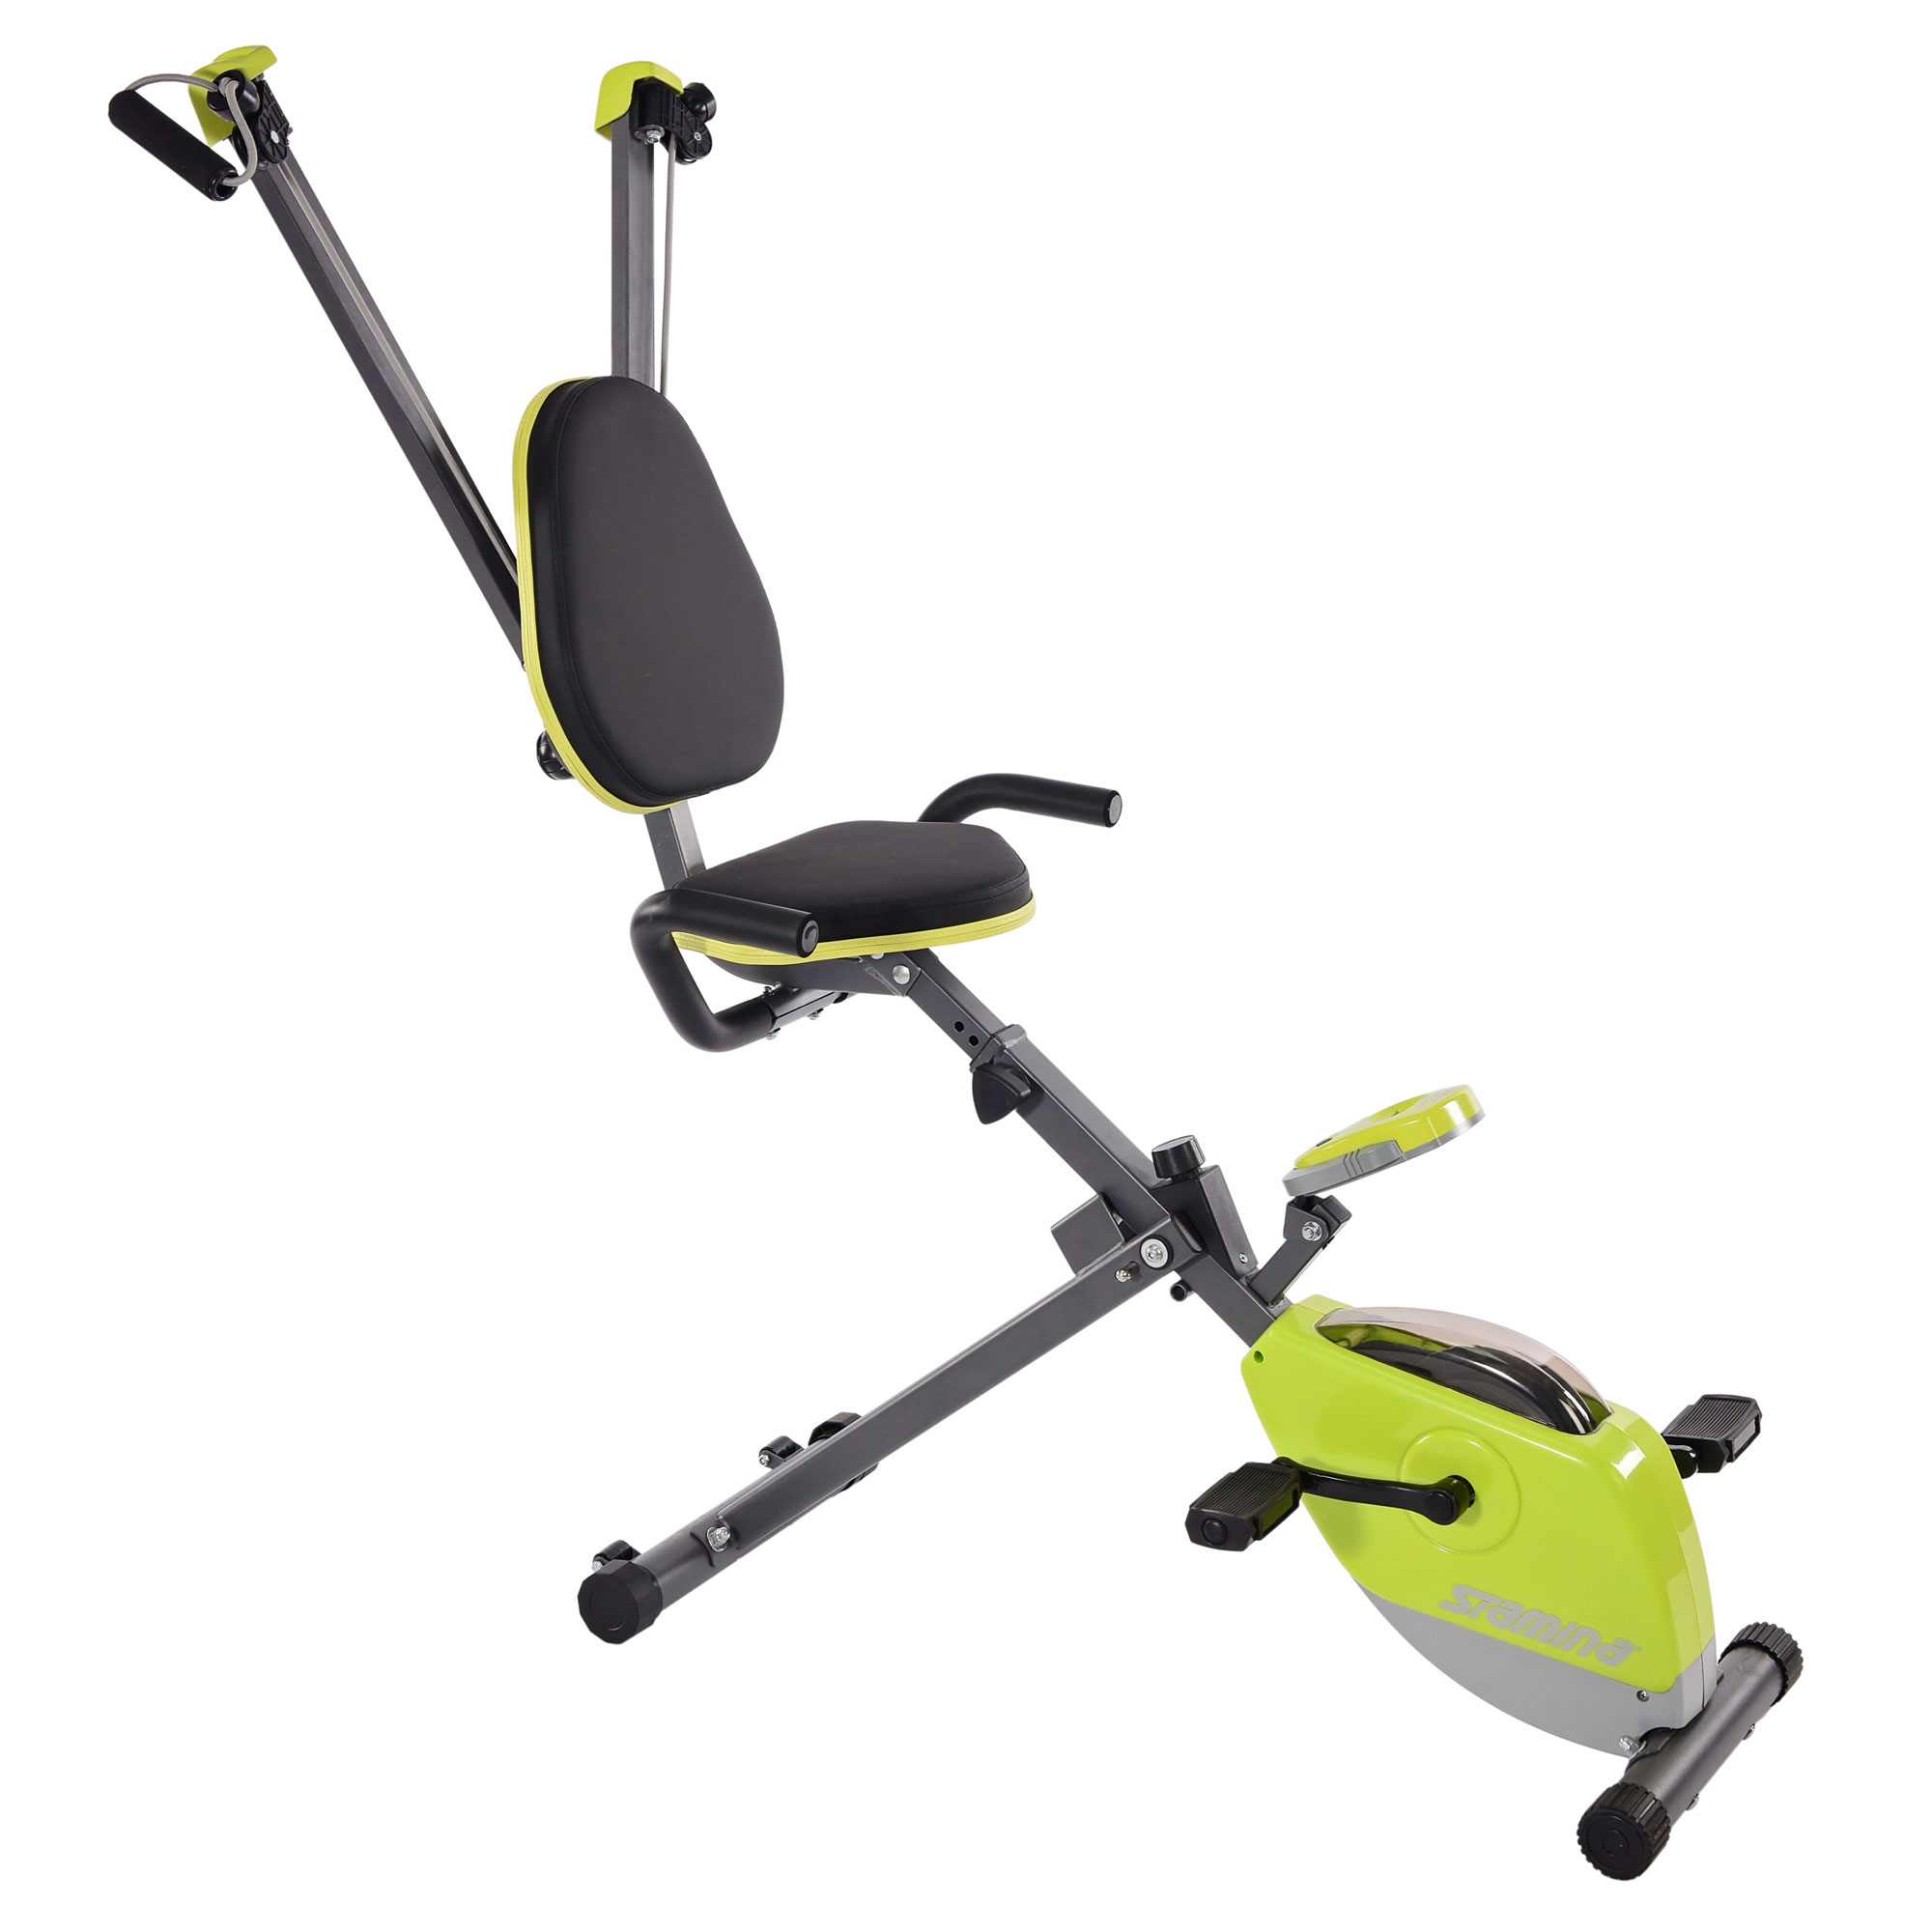 Stamina Wonder Stationary Portable Magnetic Resistance Training Exercise Bike